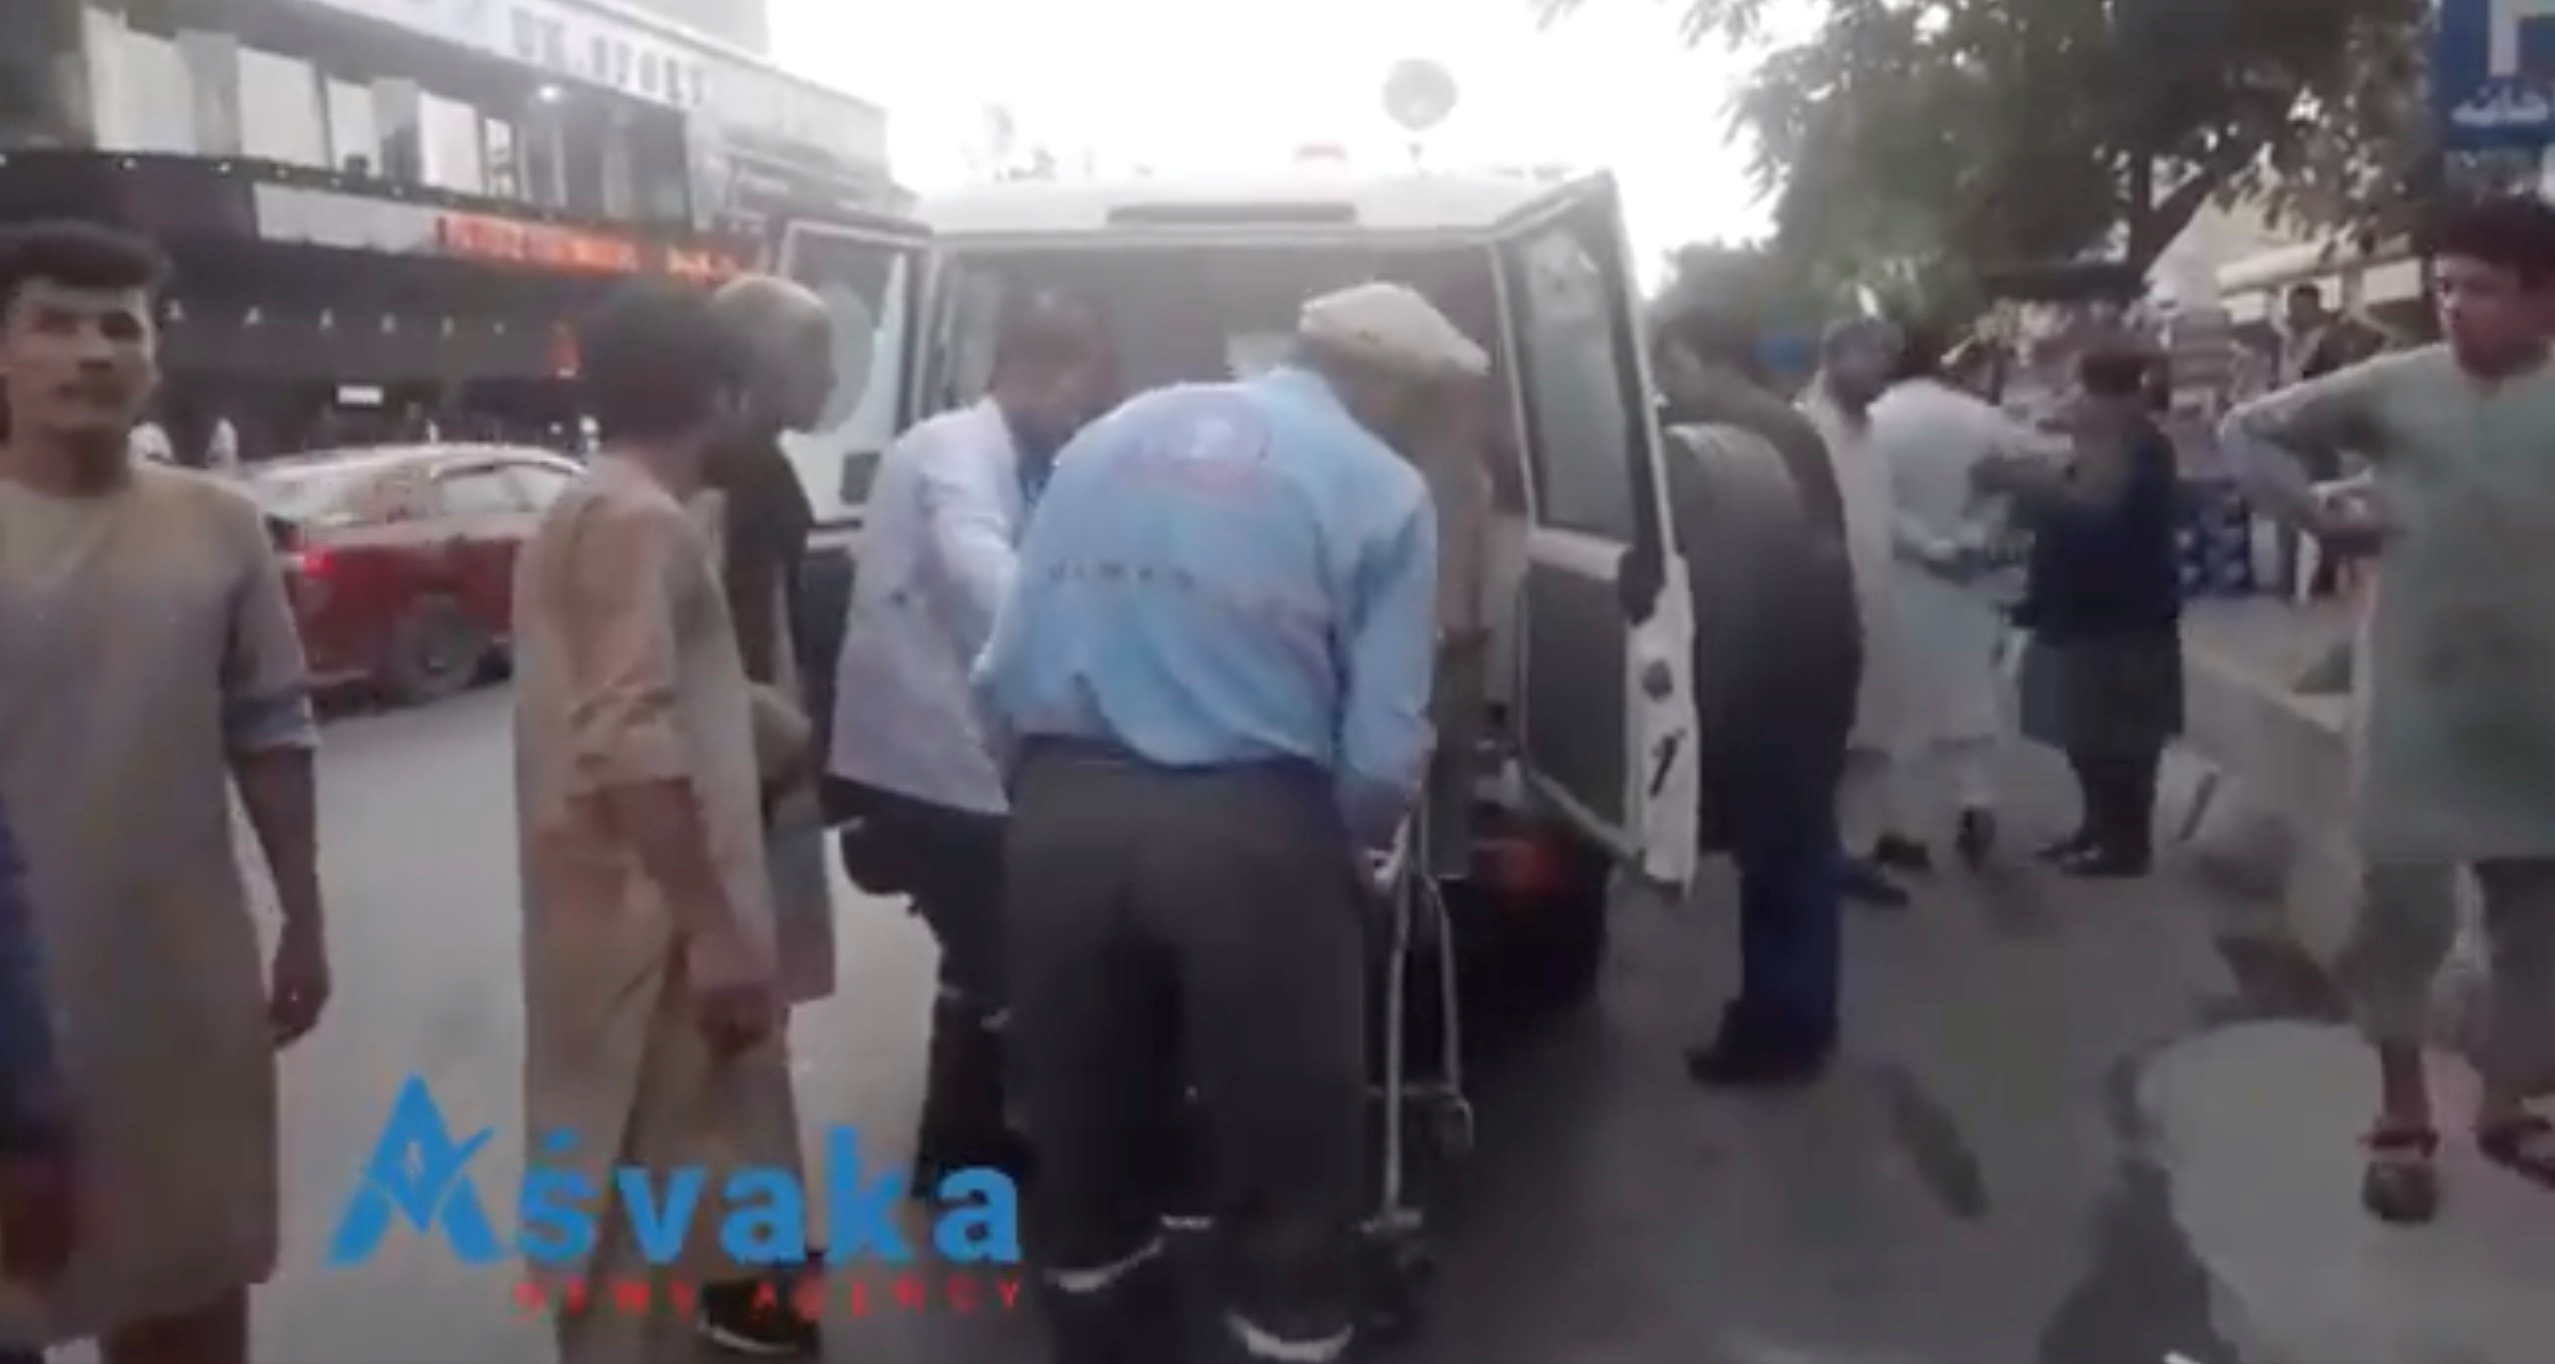 Injured people arrive at a hospital in Kabul, Afghanistan August 26, 2021. ASVAKA NEWS/via REUTERS